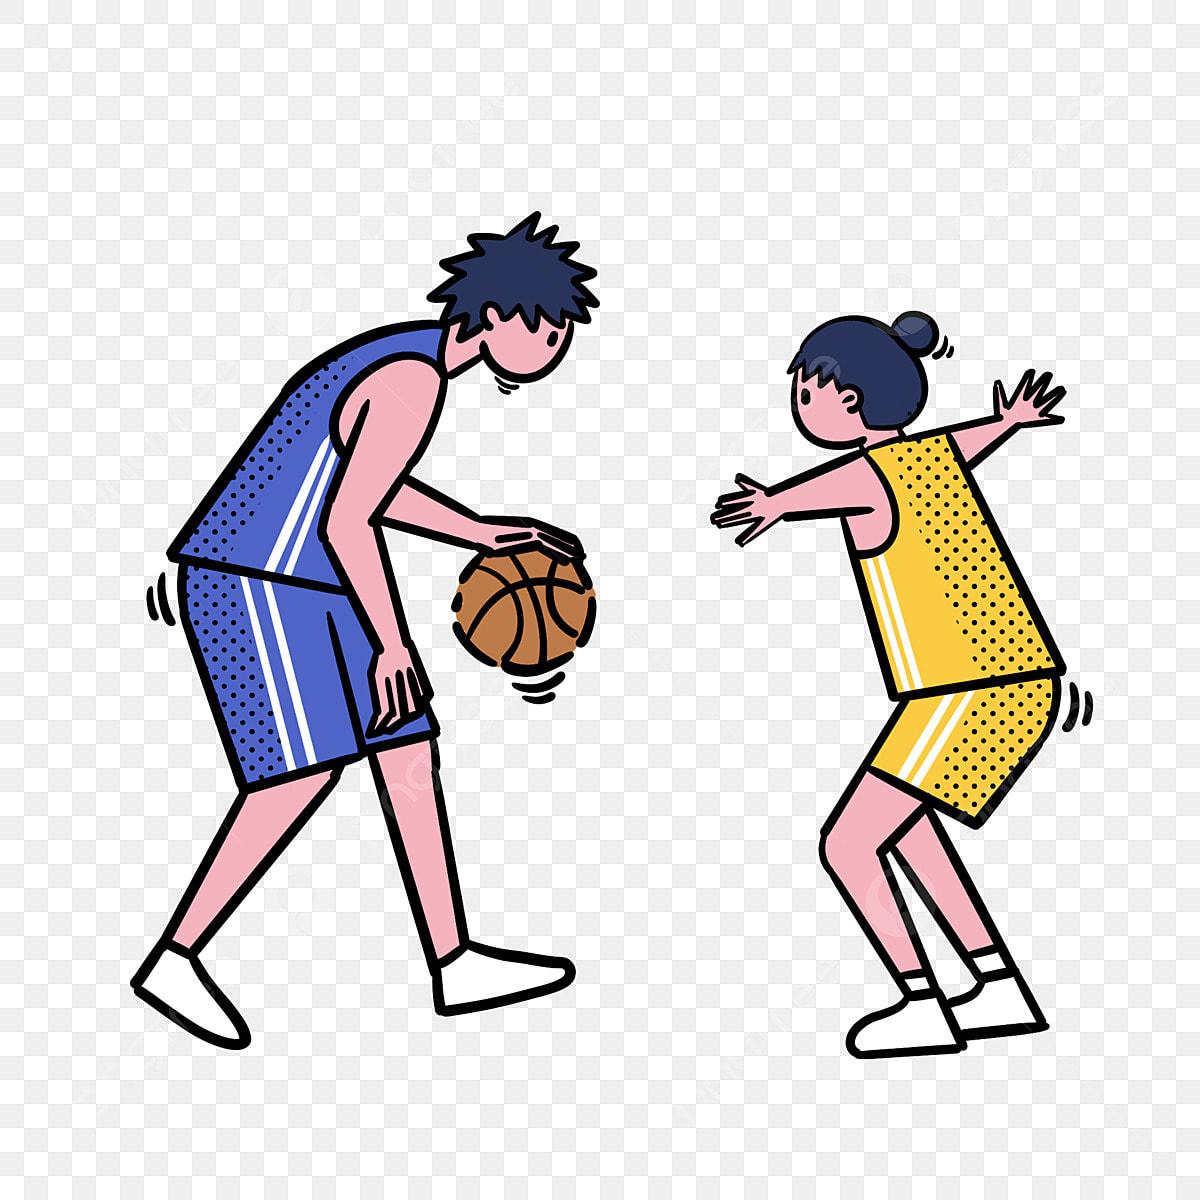 Girls Basketball Clip Art - Royalty Free - GoGraph